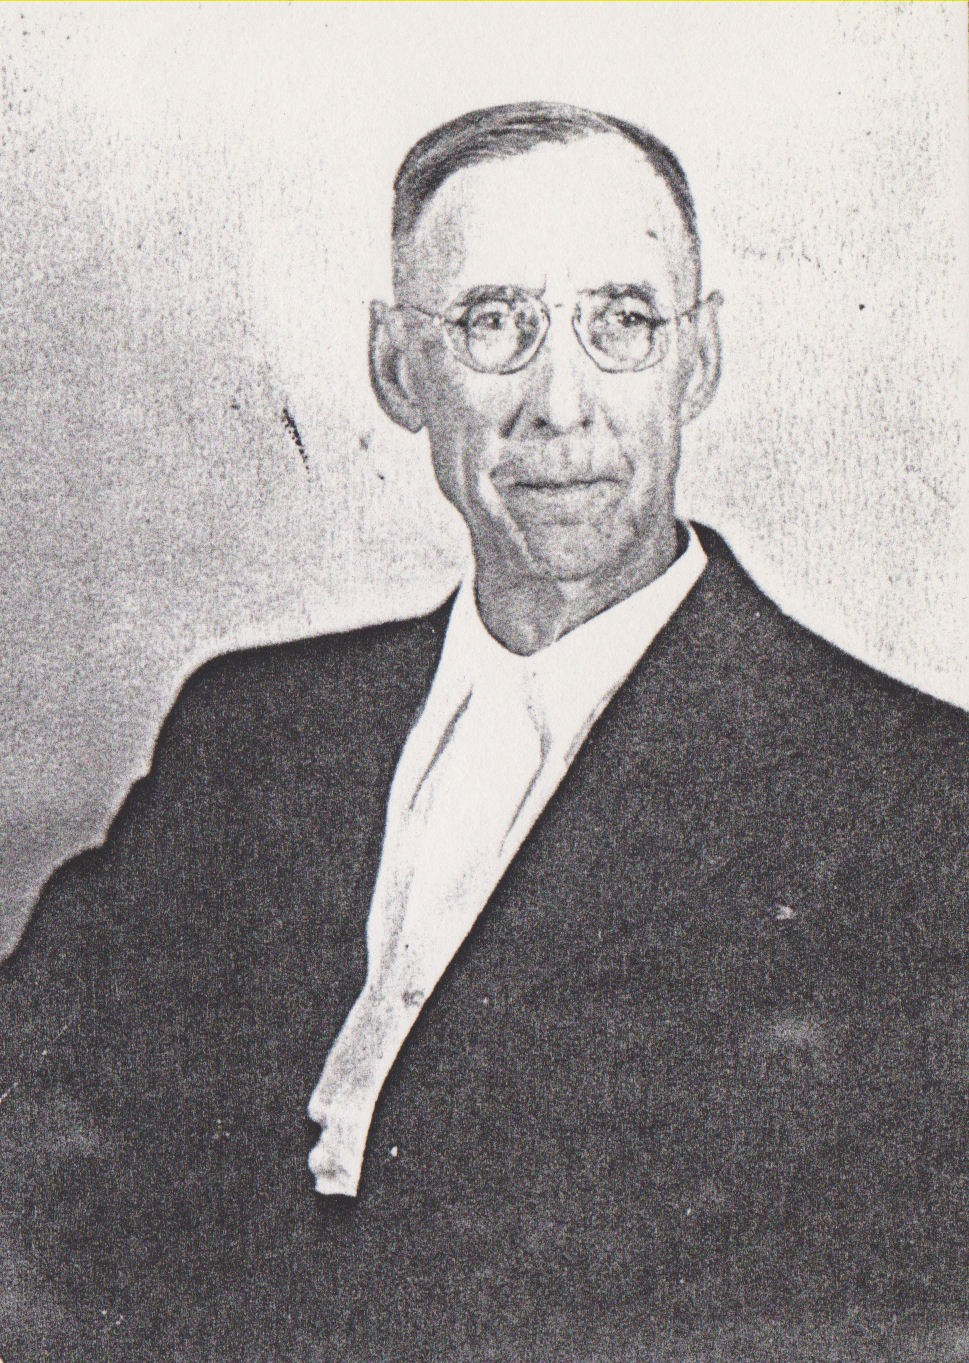 Andrew Jackson Adkins